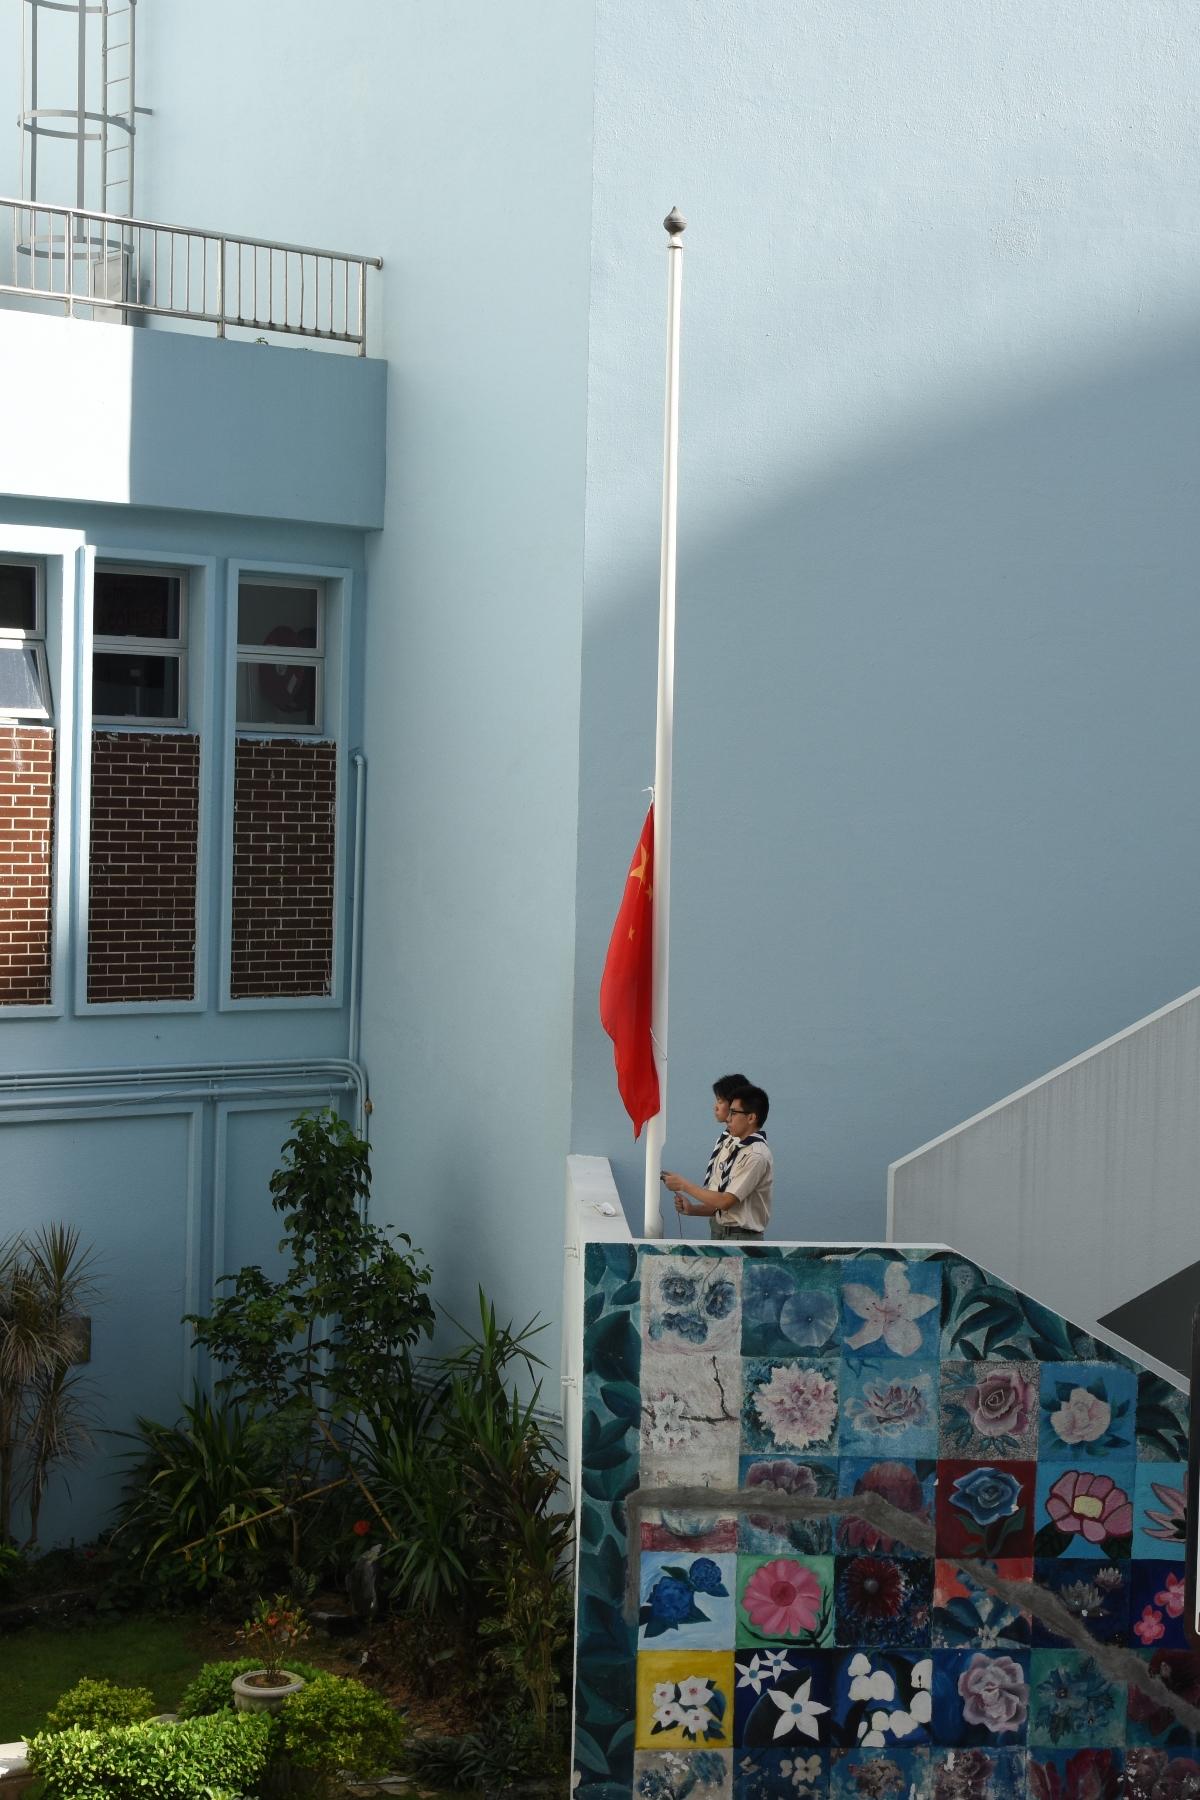 http://www.npc.edu.hk/sites/default/files/dsc_1339.jpg